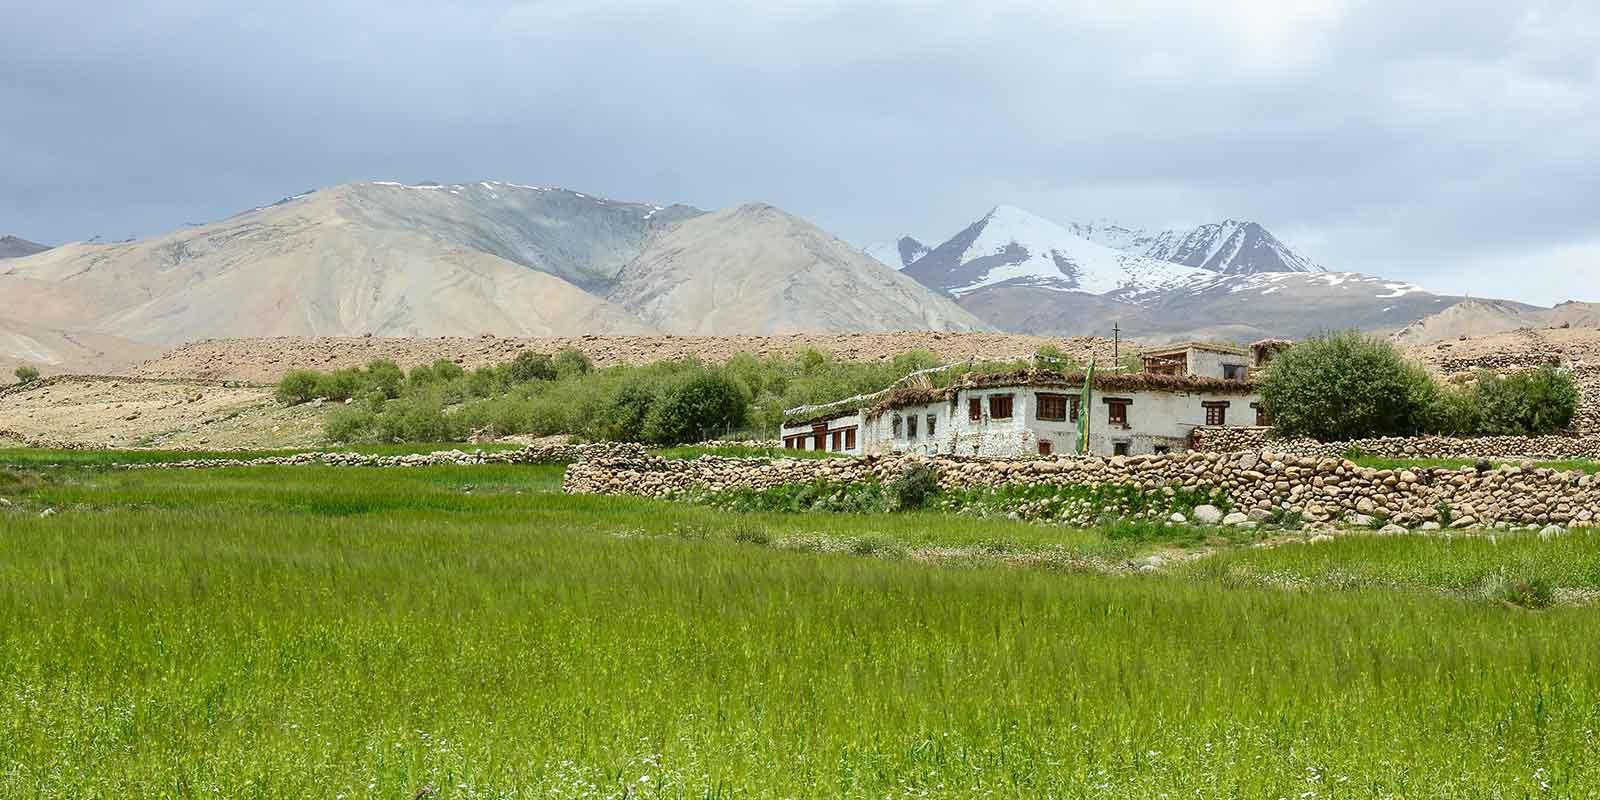 Picturesque Tibetan village in mountainous valley in Ladakh